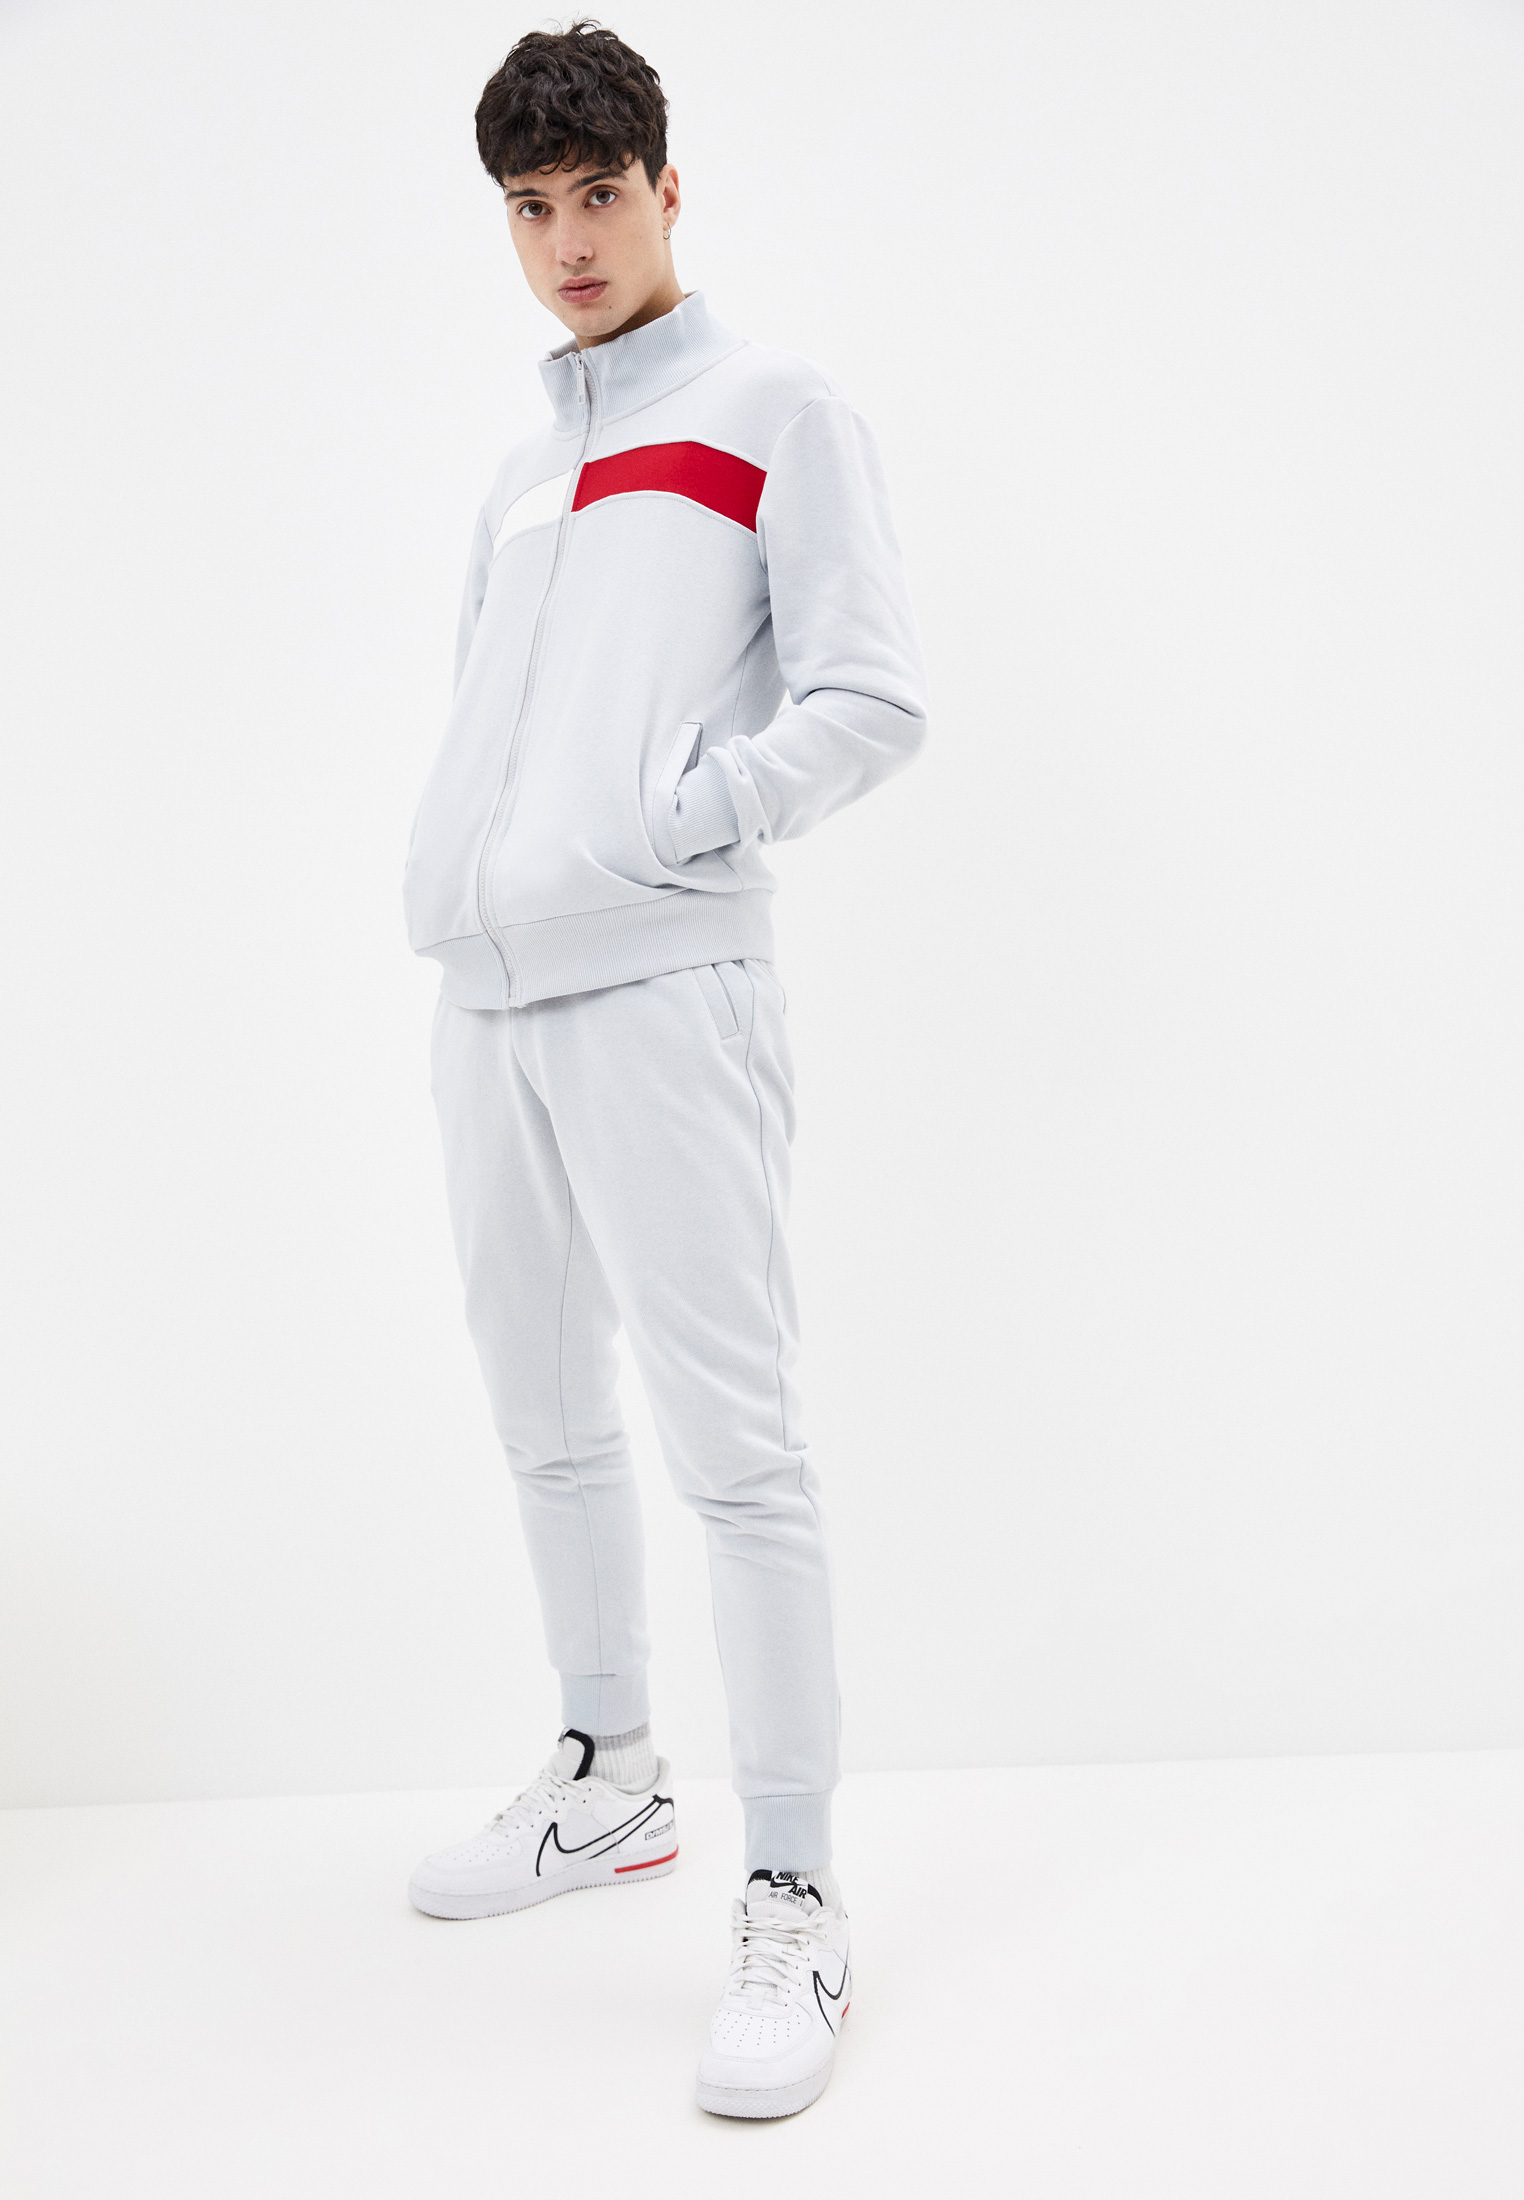 Спортивный костюм Sitlly 21812